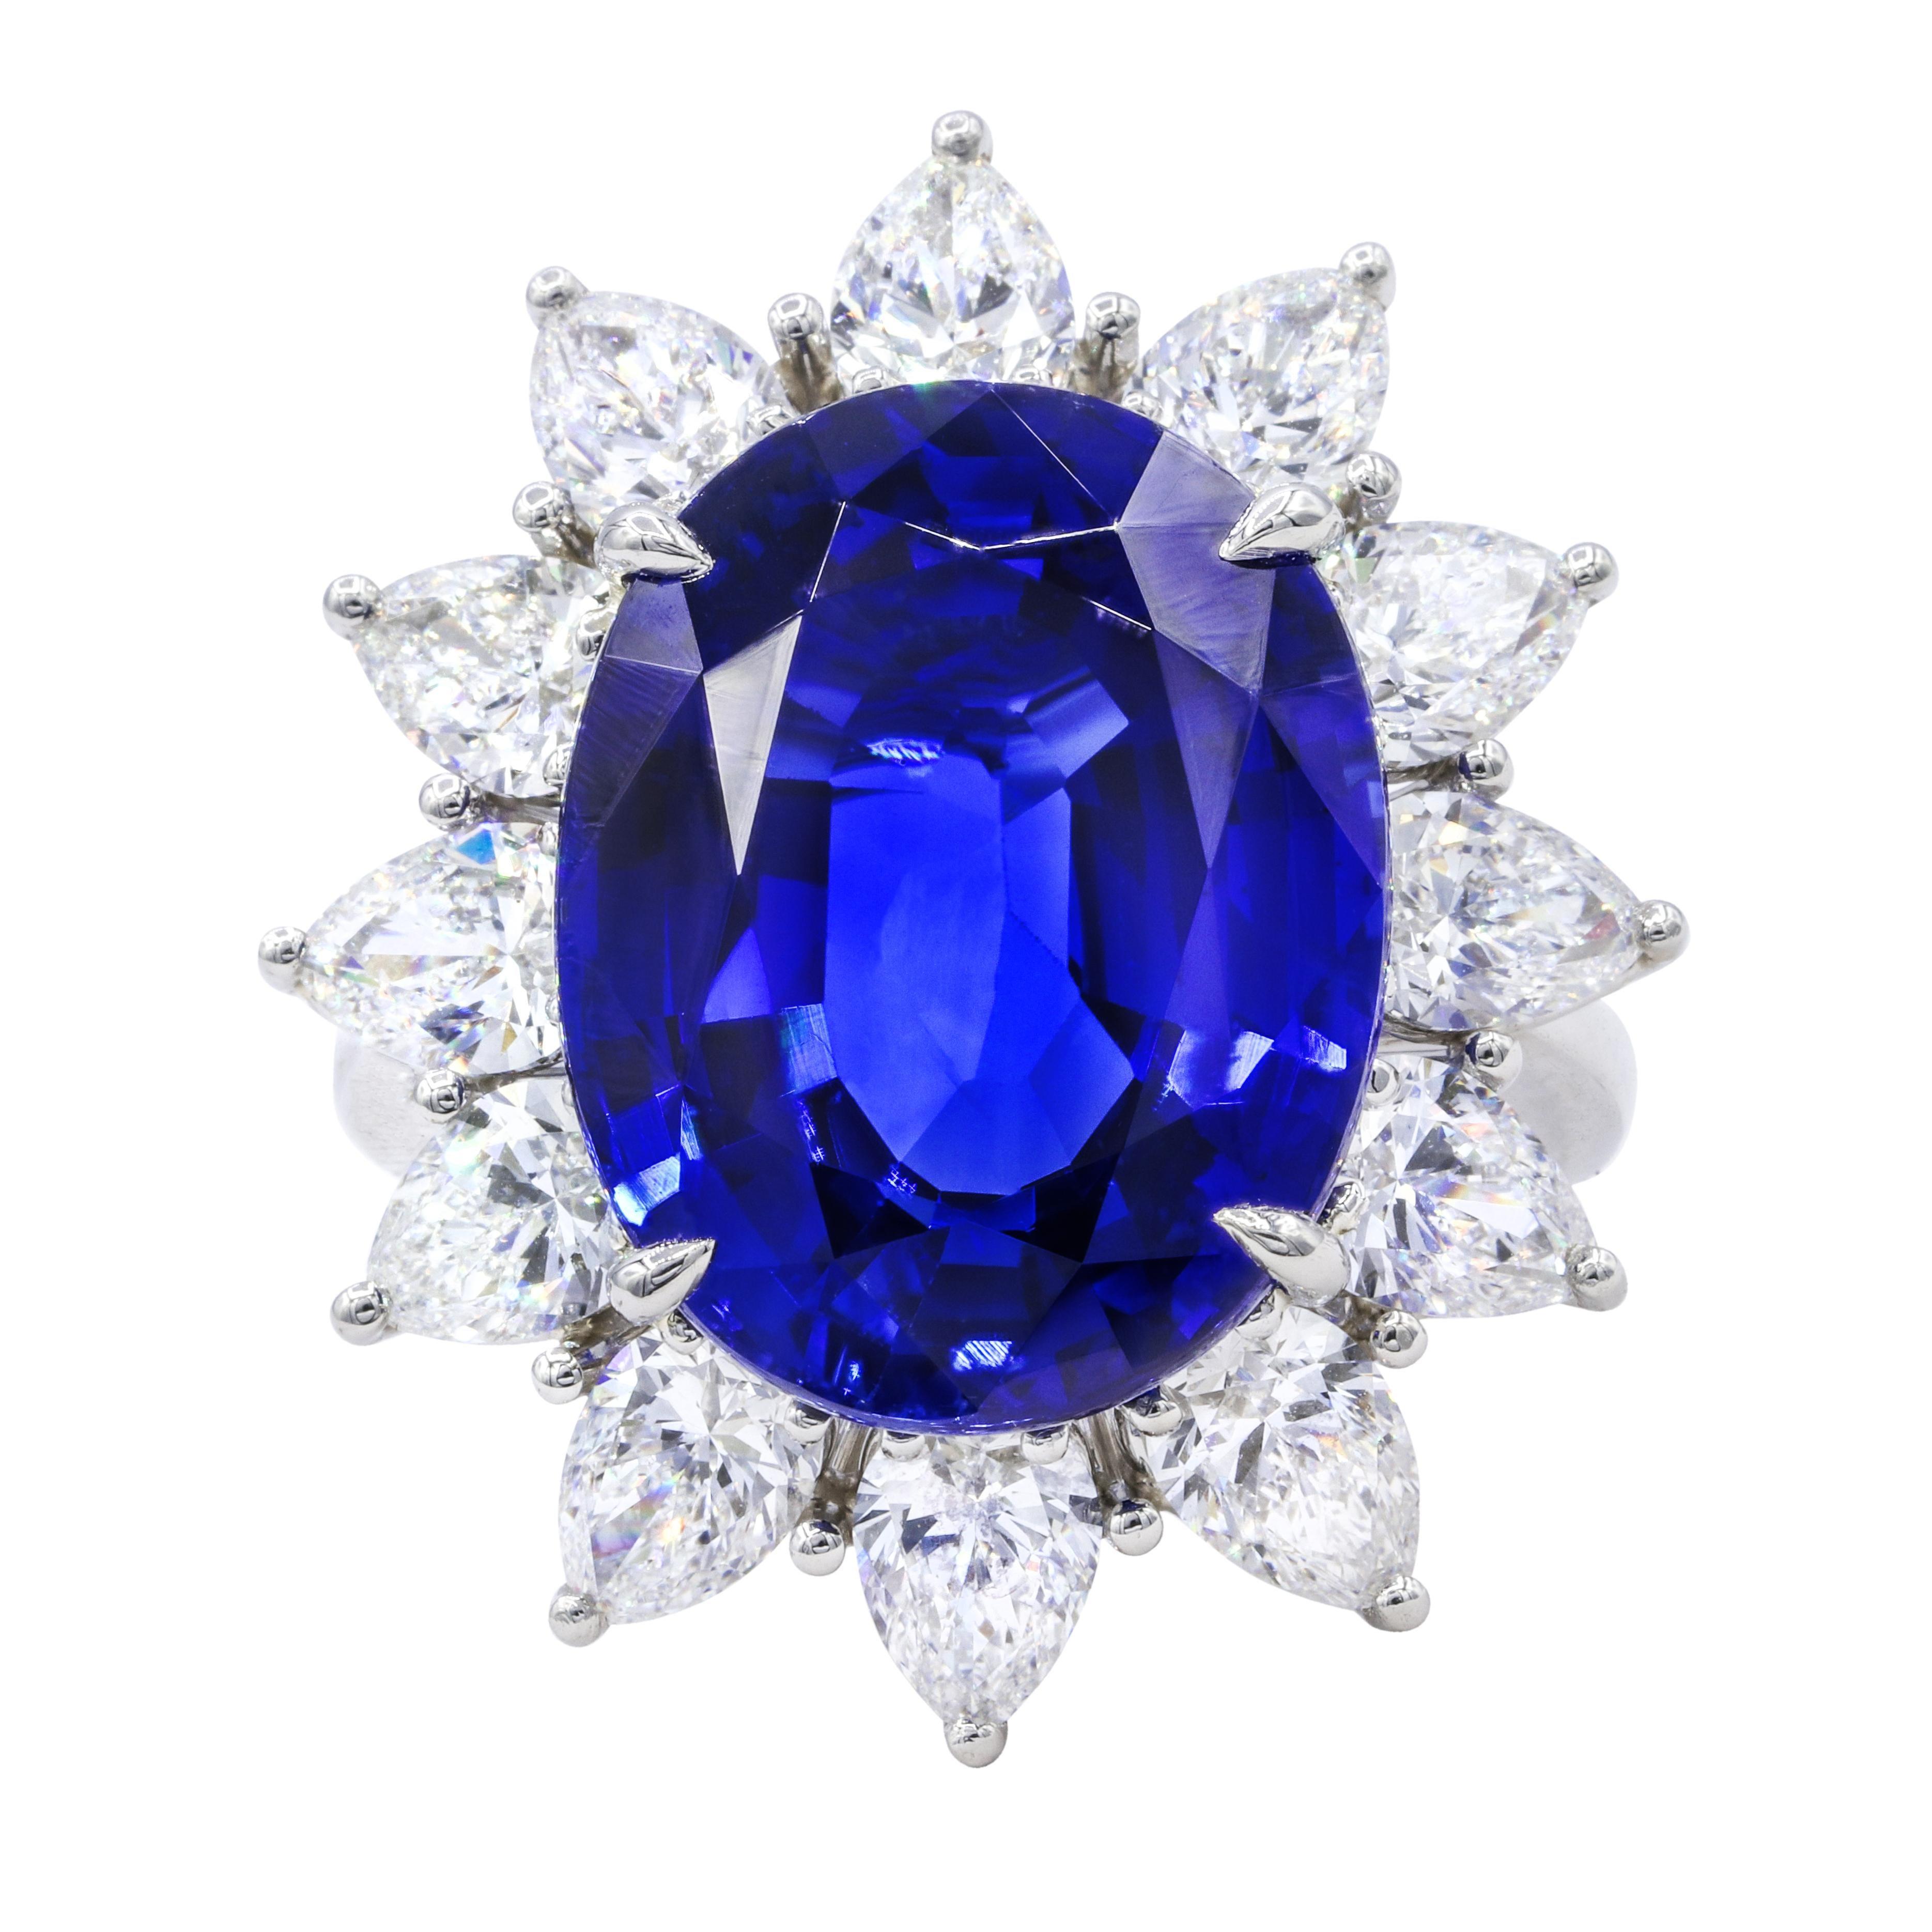 Certified 16.20 Carat Platinum Sapphire and Diamond Ring